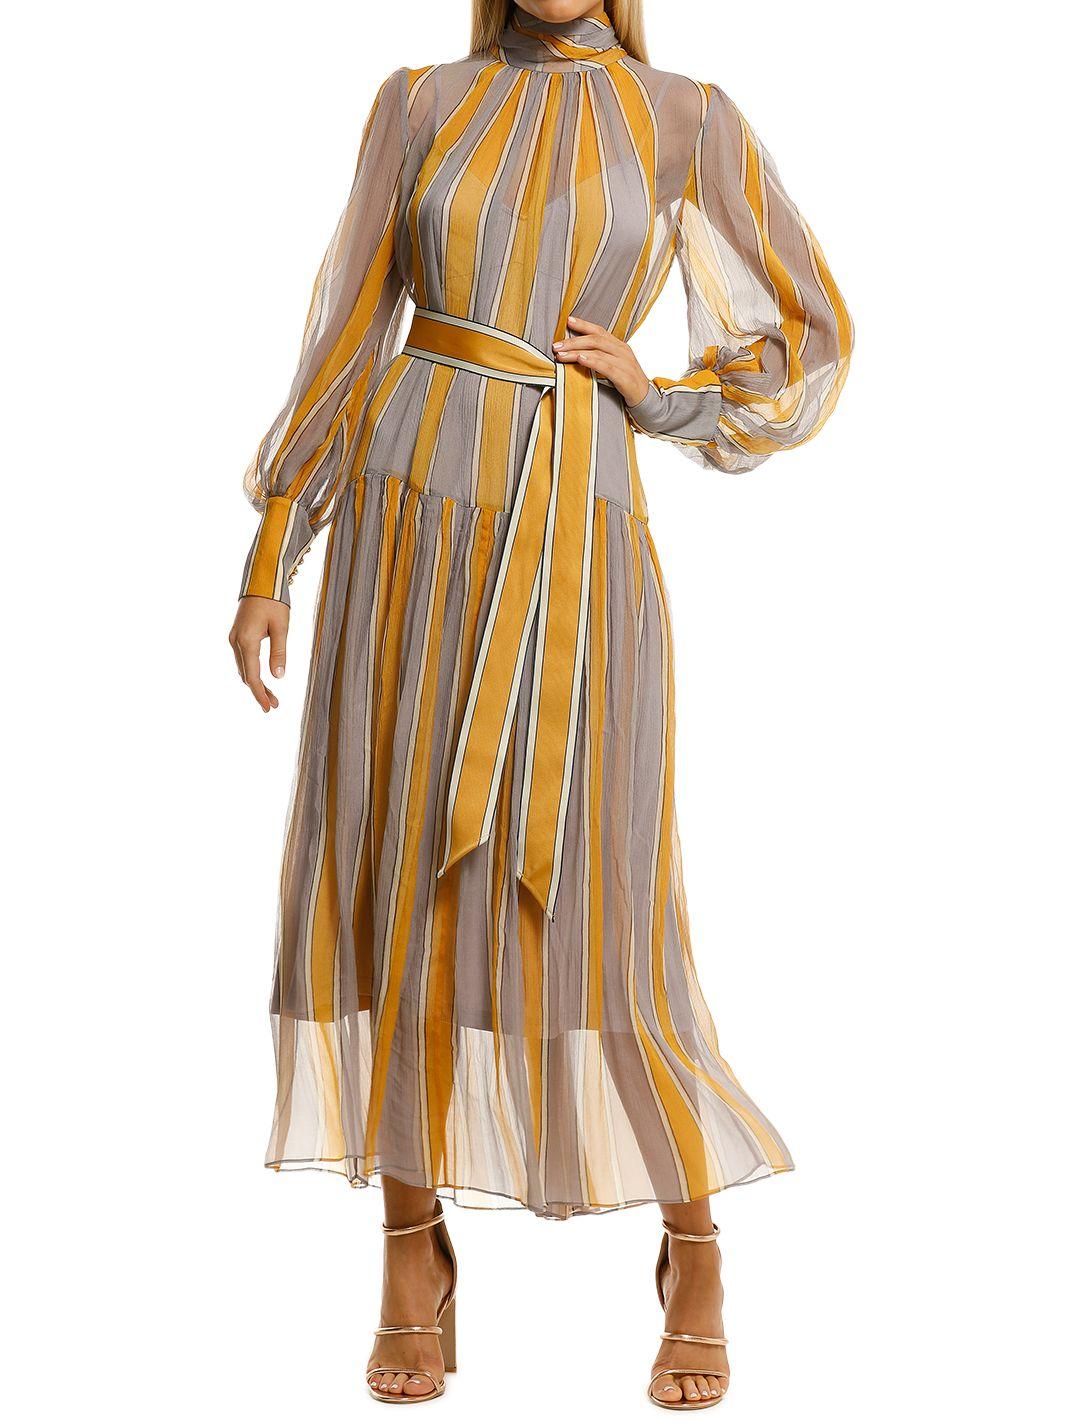 Zimmermann-Sabotage-Roll-Neck-Dress-Violet-Stripe-Front